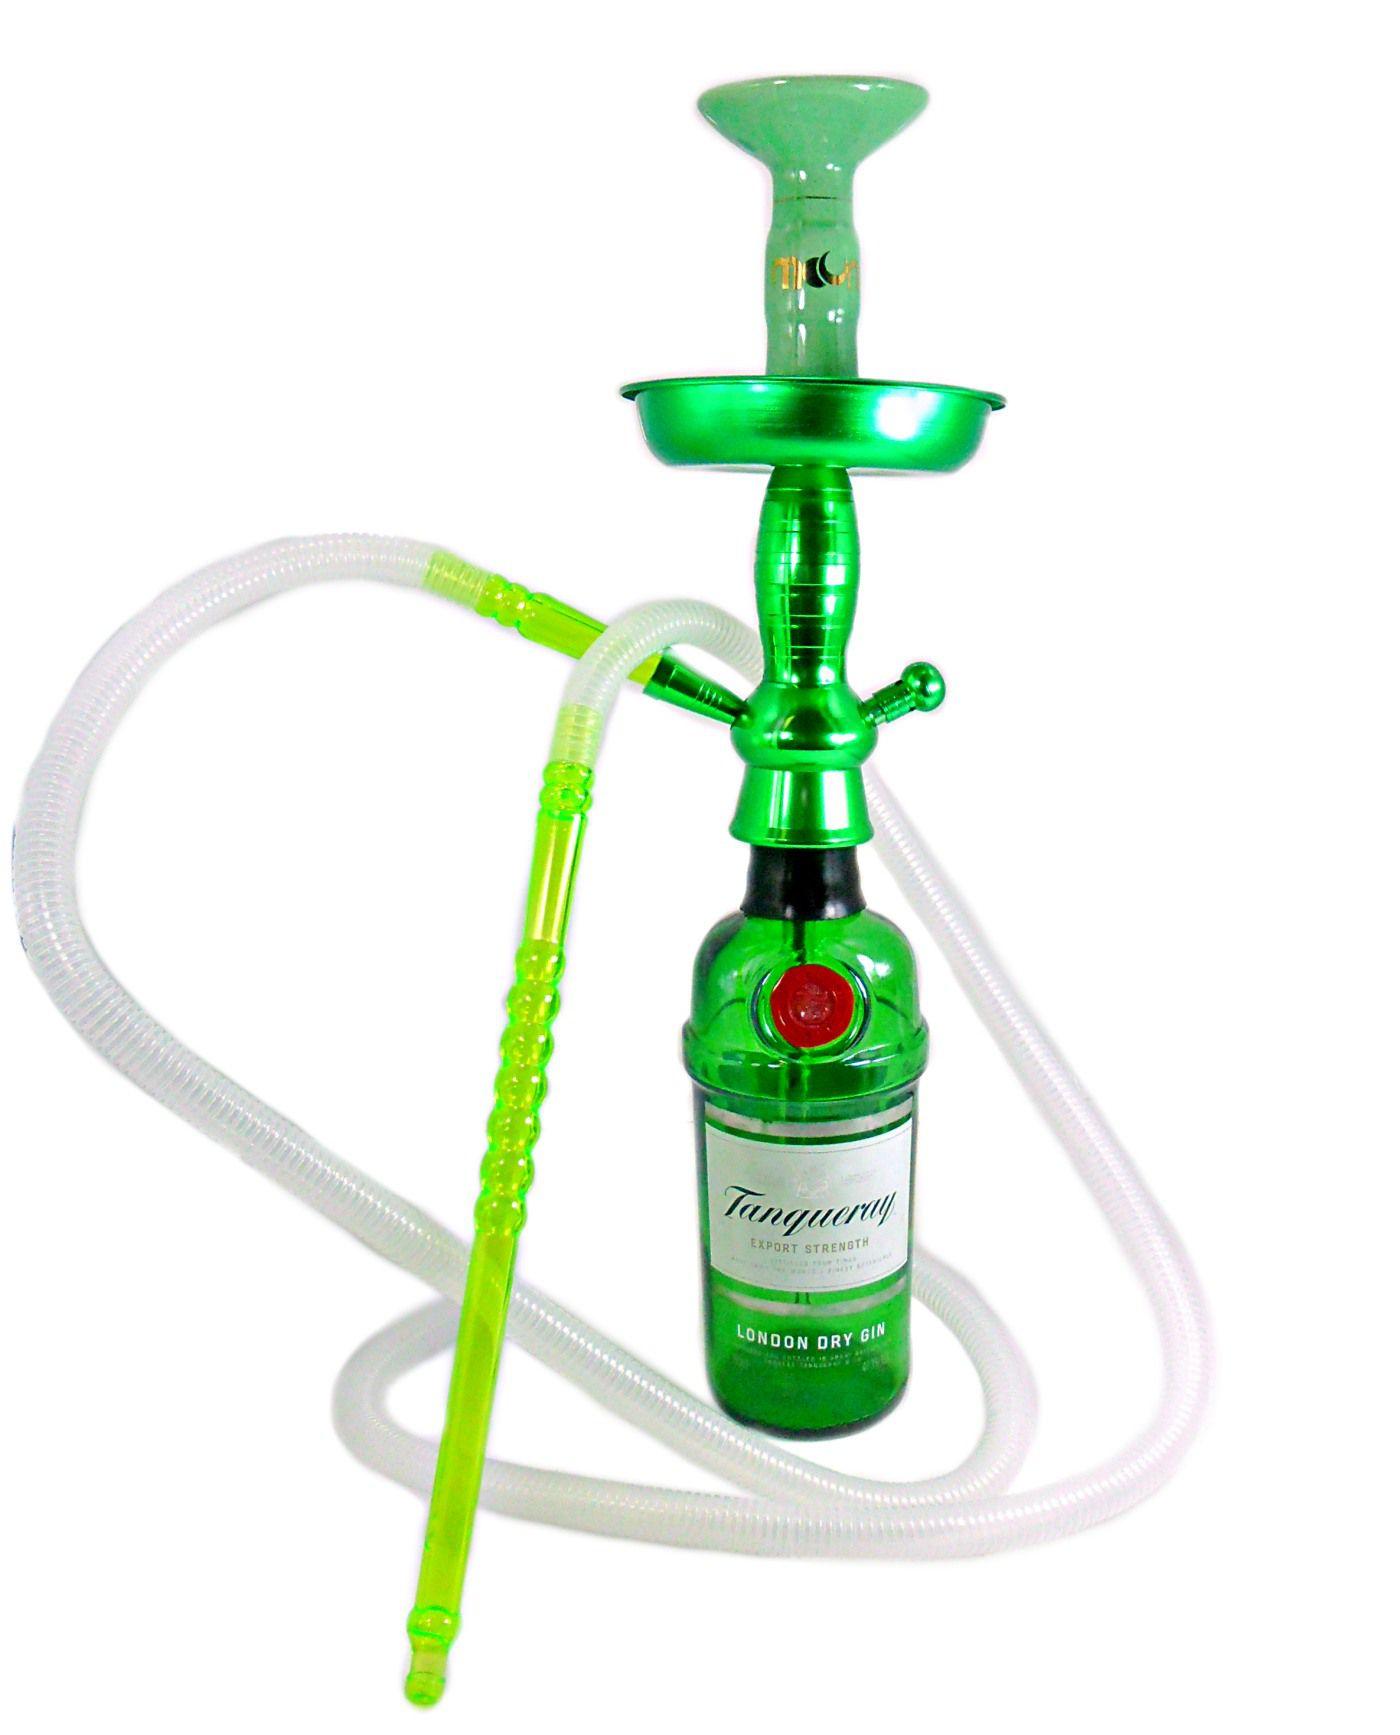 Narguile de garrafa 50cm: Stem alumínio verde+ prato 13cm+ rosh Moon verde e dourado + garrafa Gin inglês.